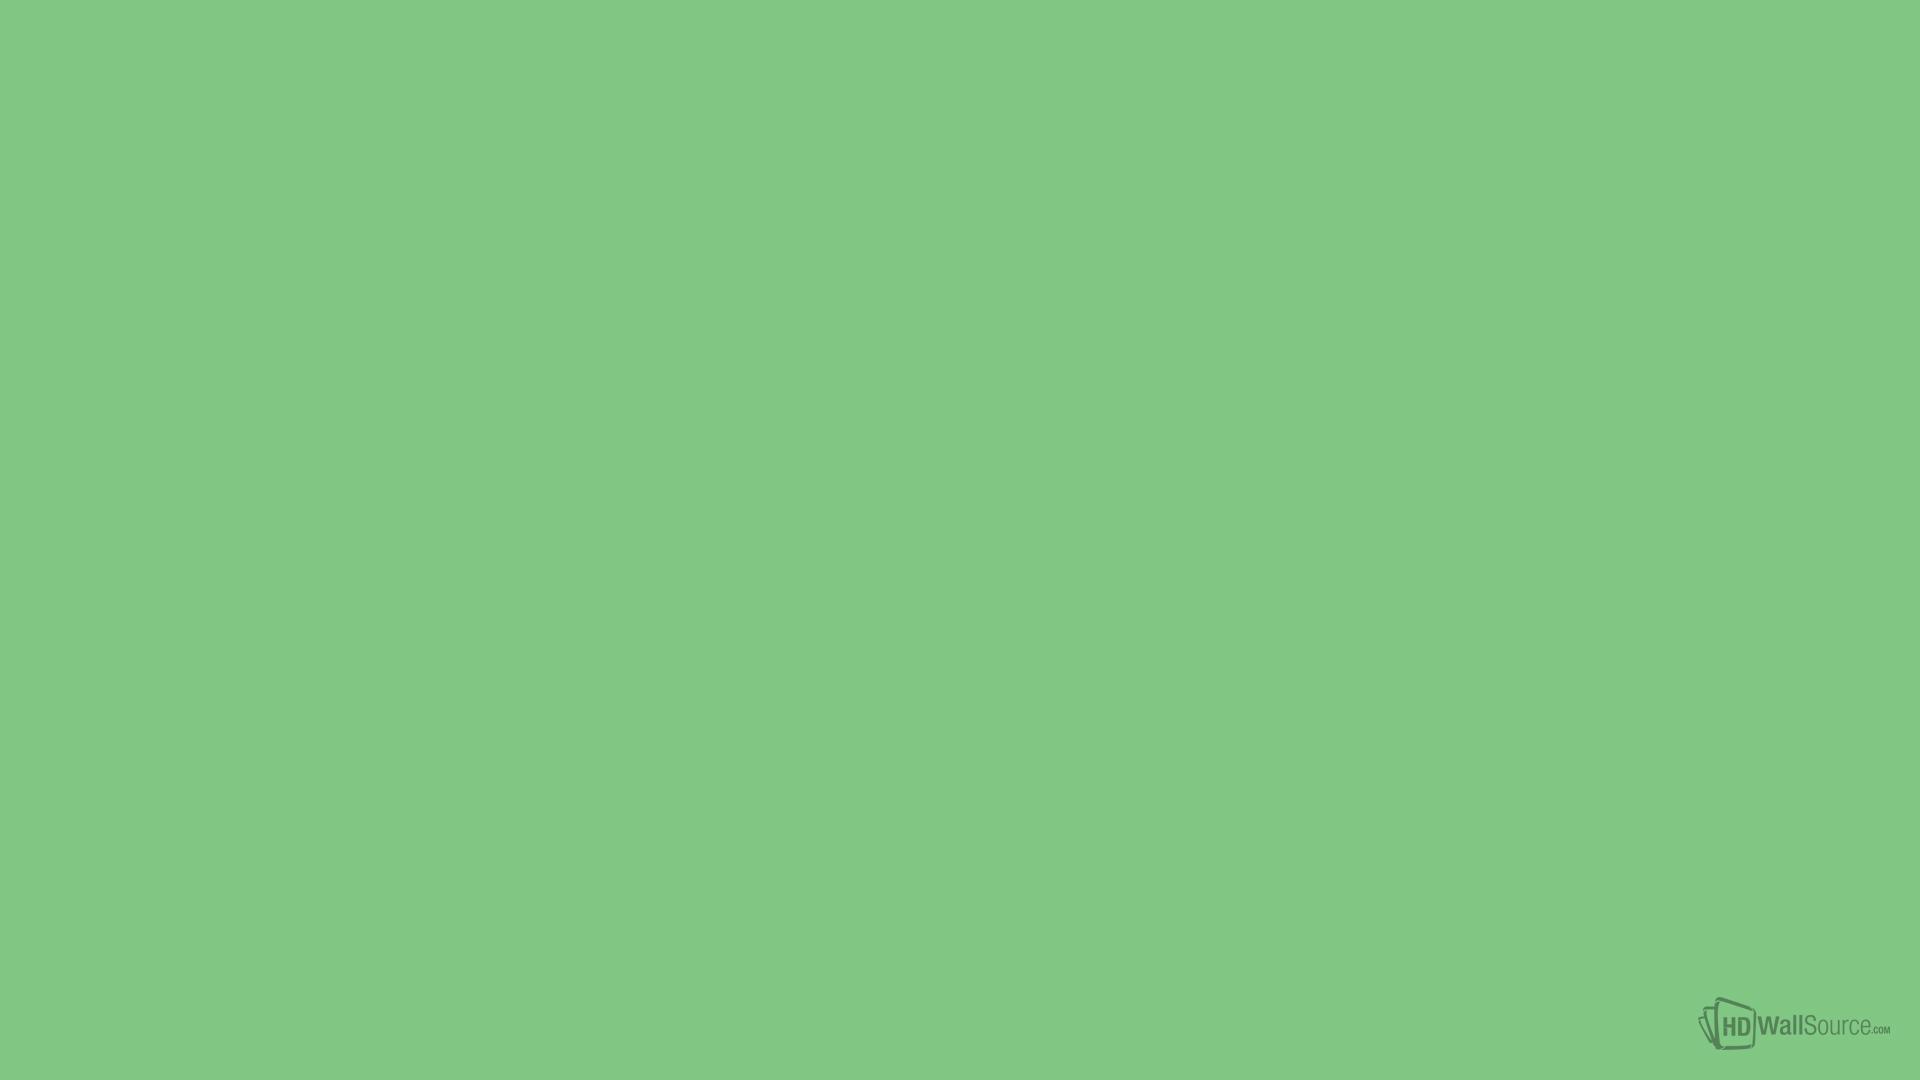 81c784 wallpaper 70550